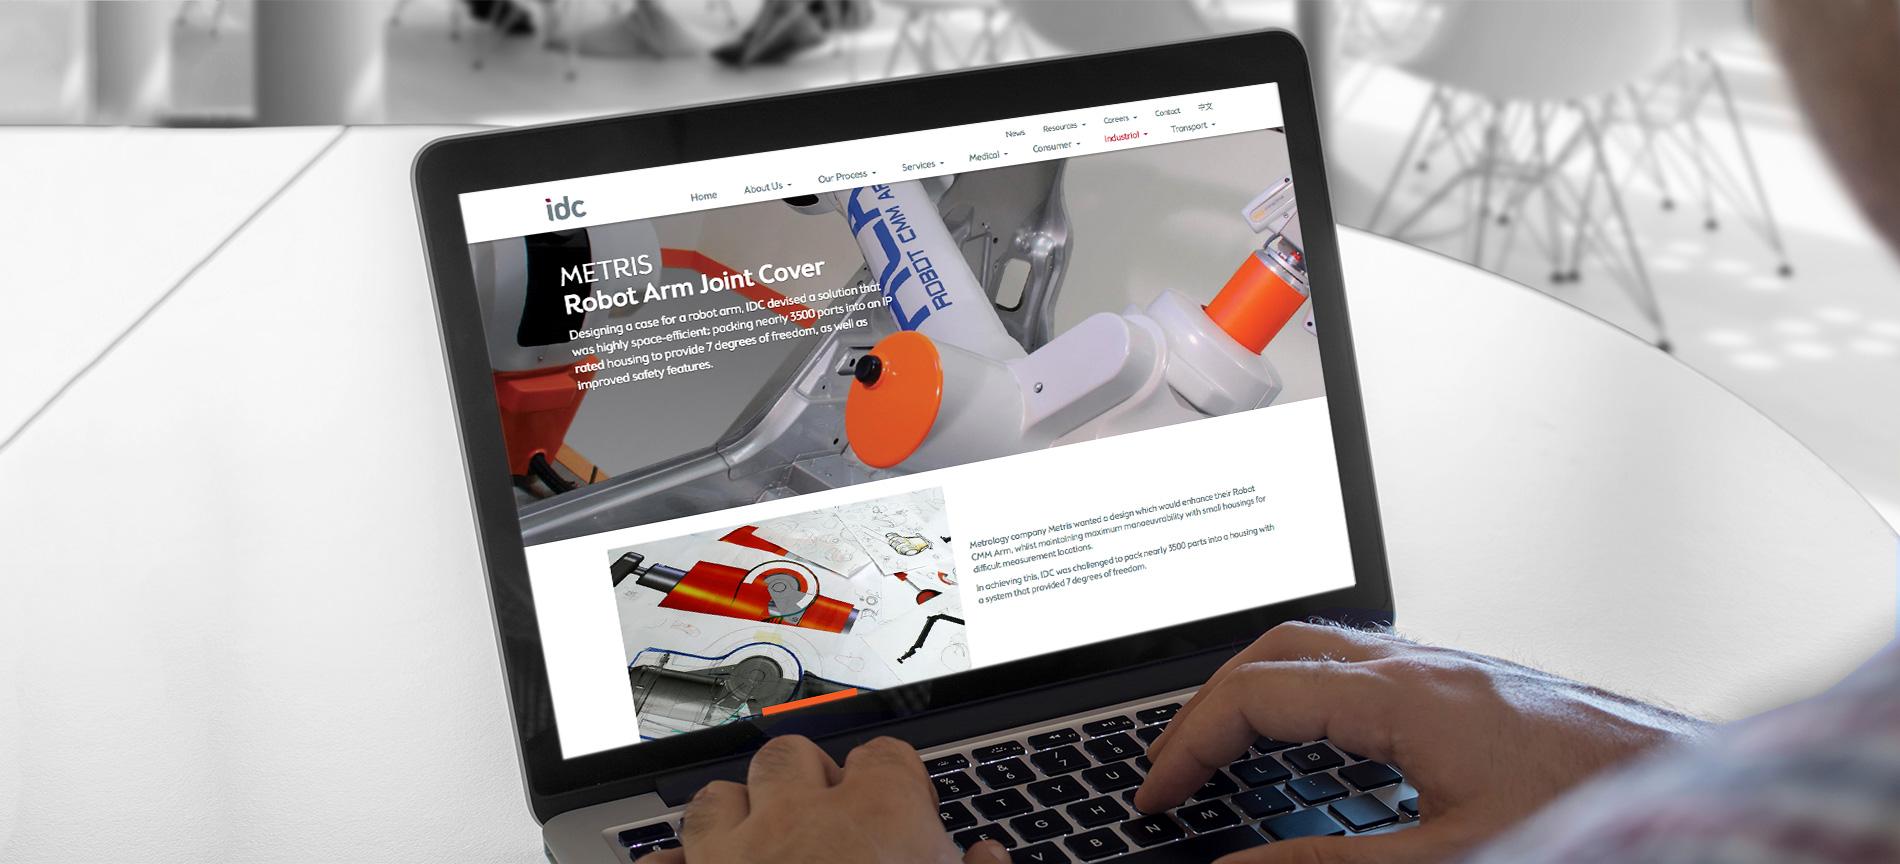 IDC website product page on a laptop - desktop